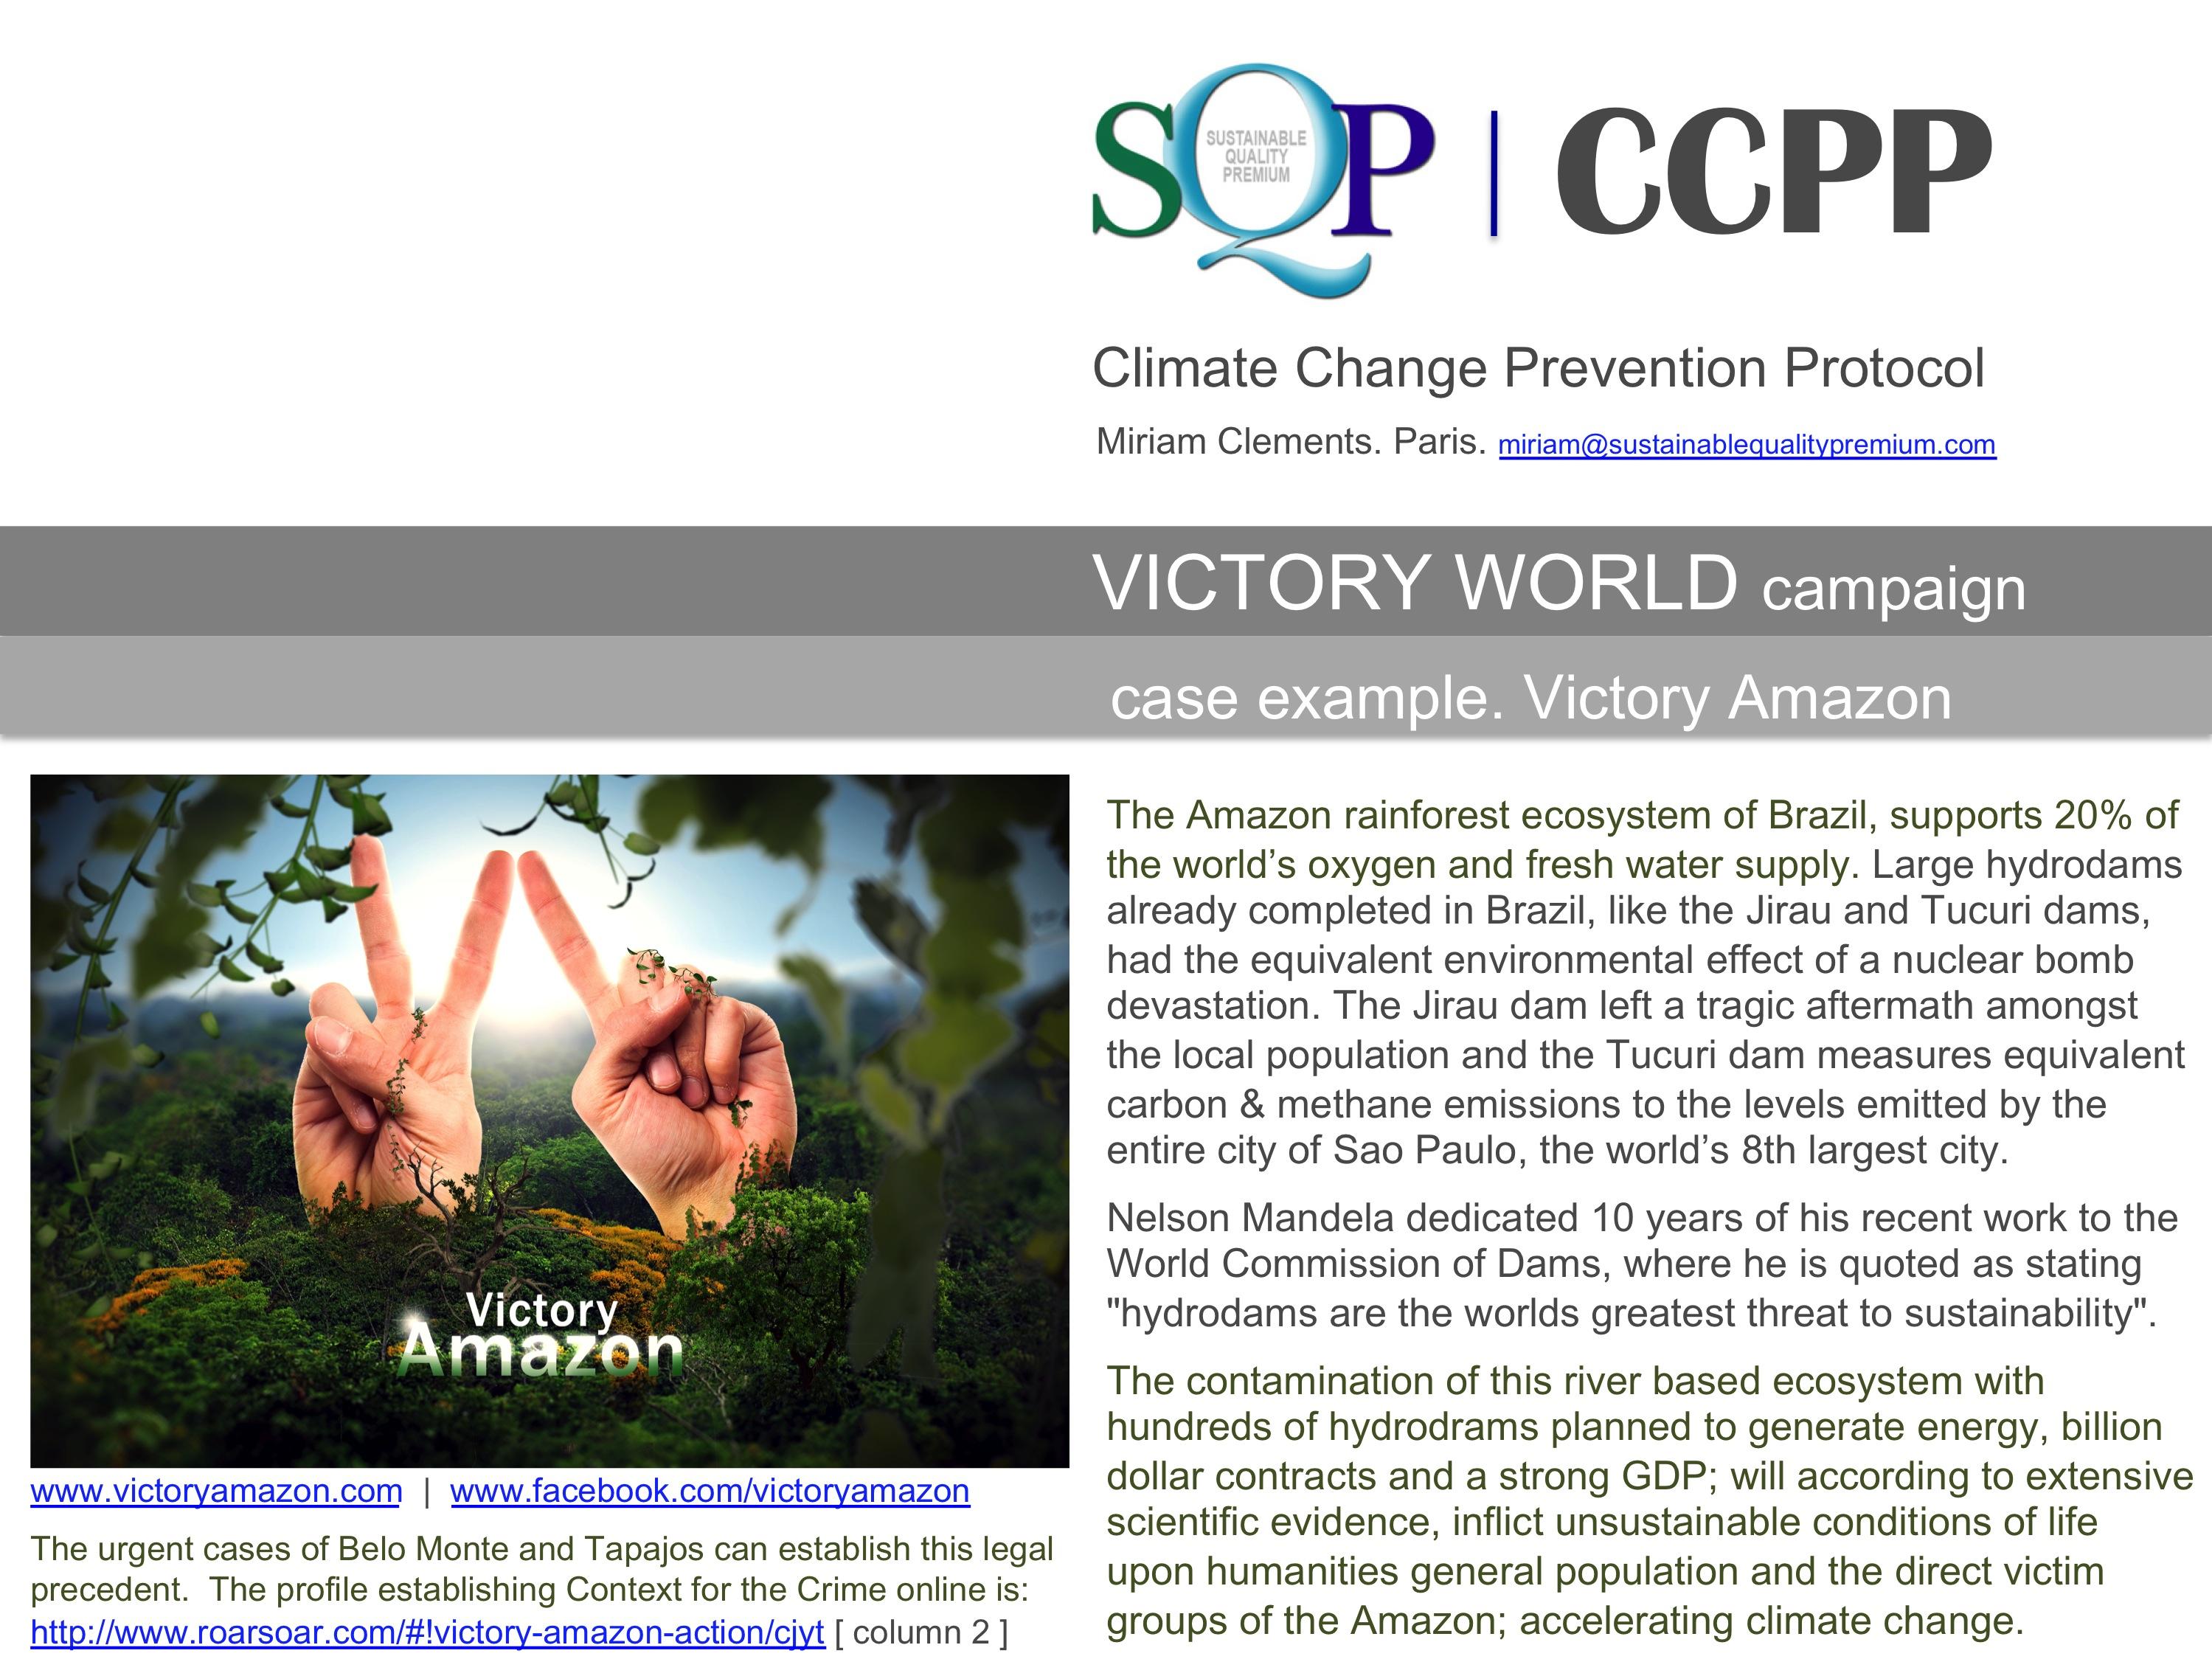 SQP CCPP case: Victory Amazon